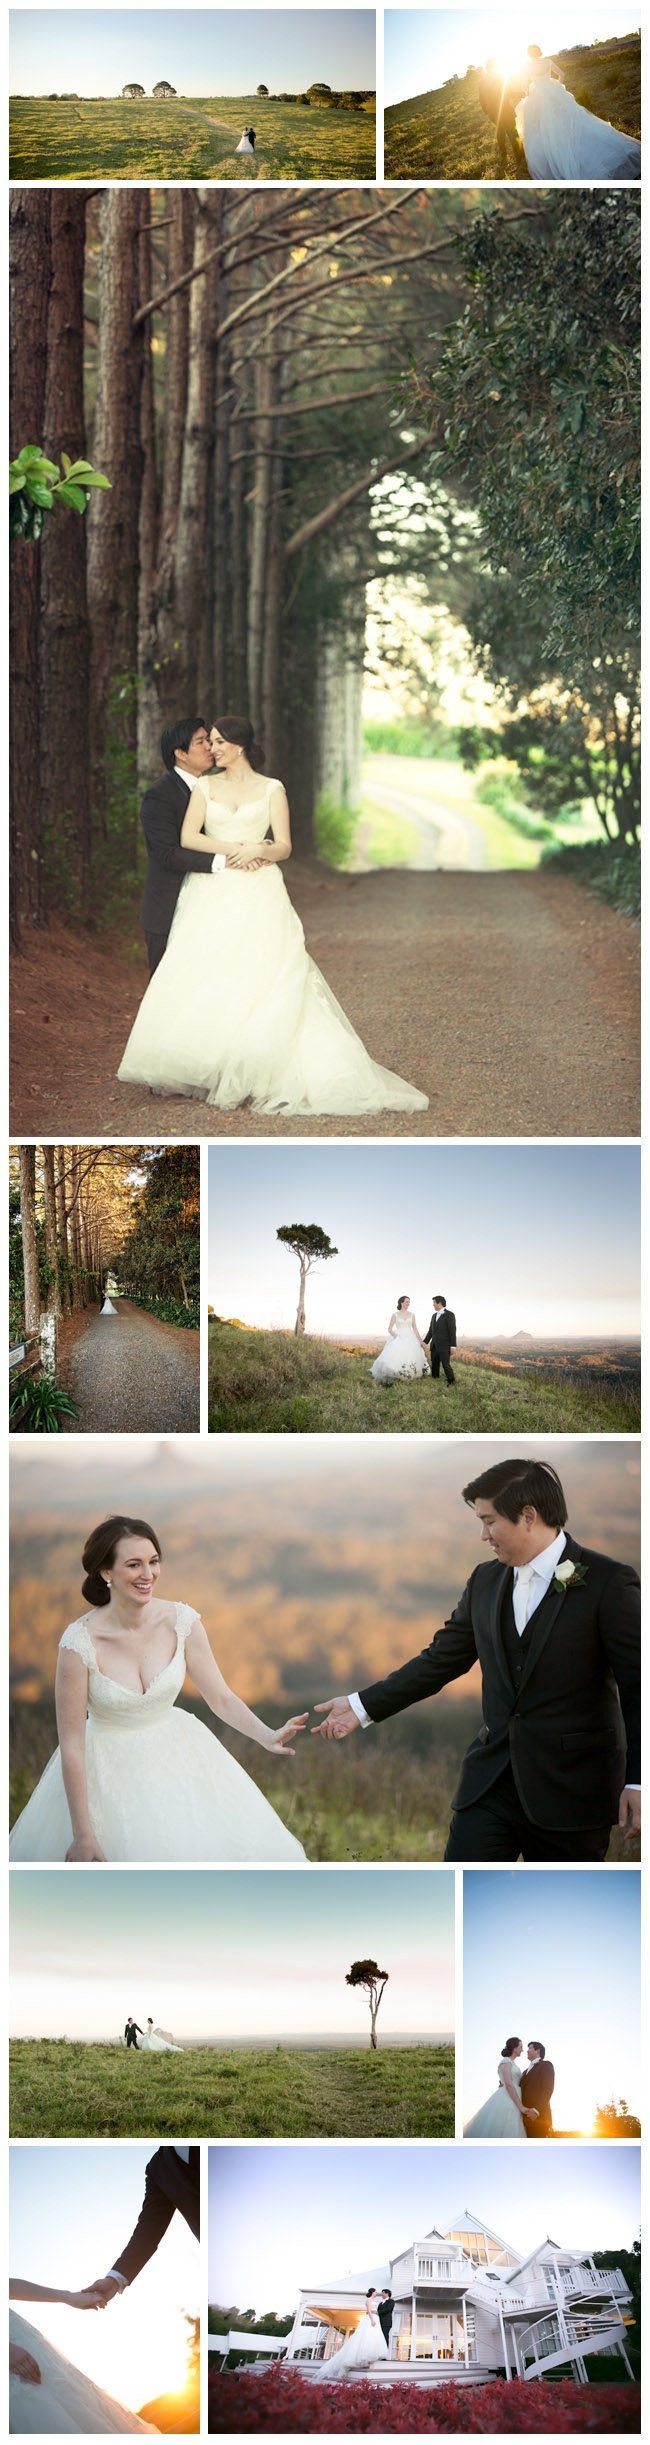 Maleny Manor Wedding Photography   focusfilms.com.au